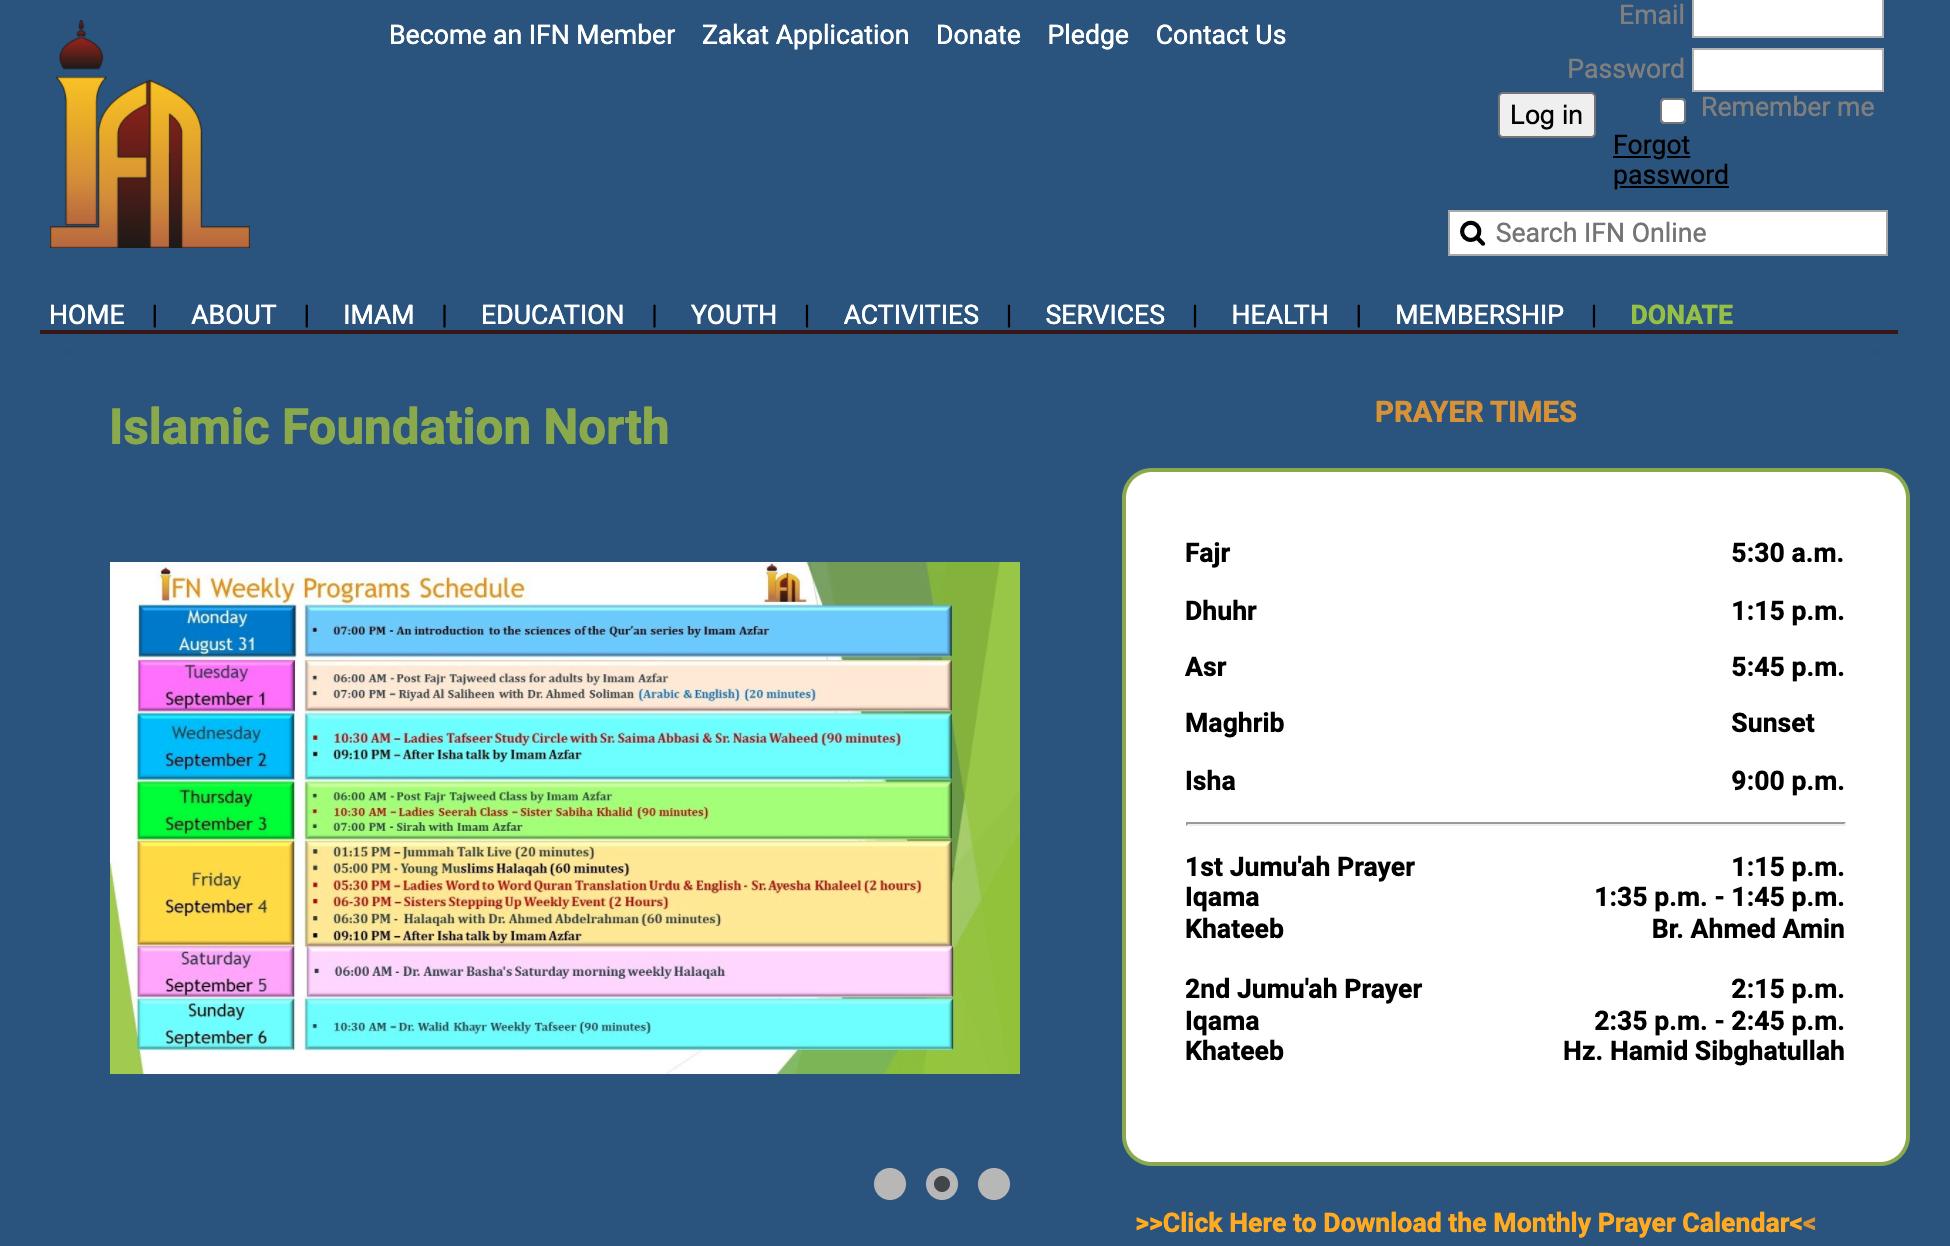 Islamic Foundation North